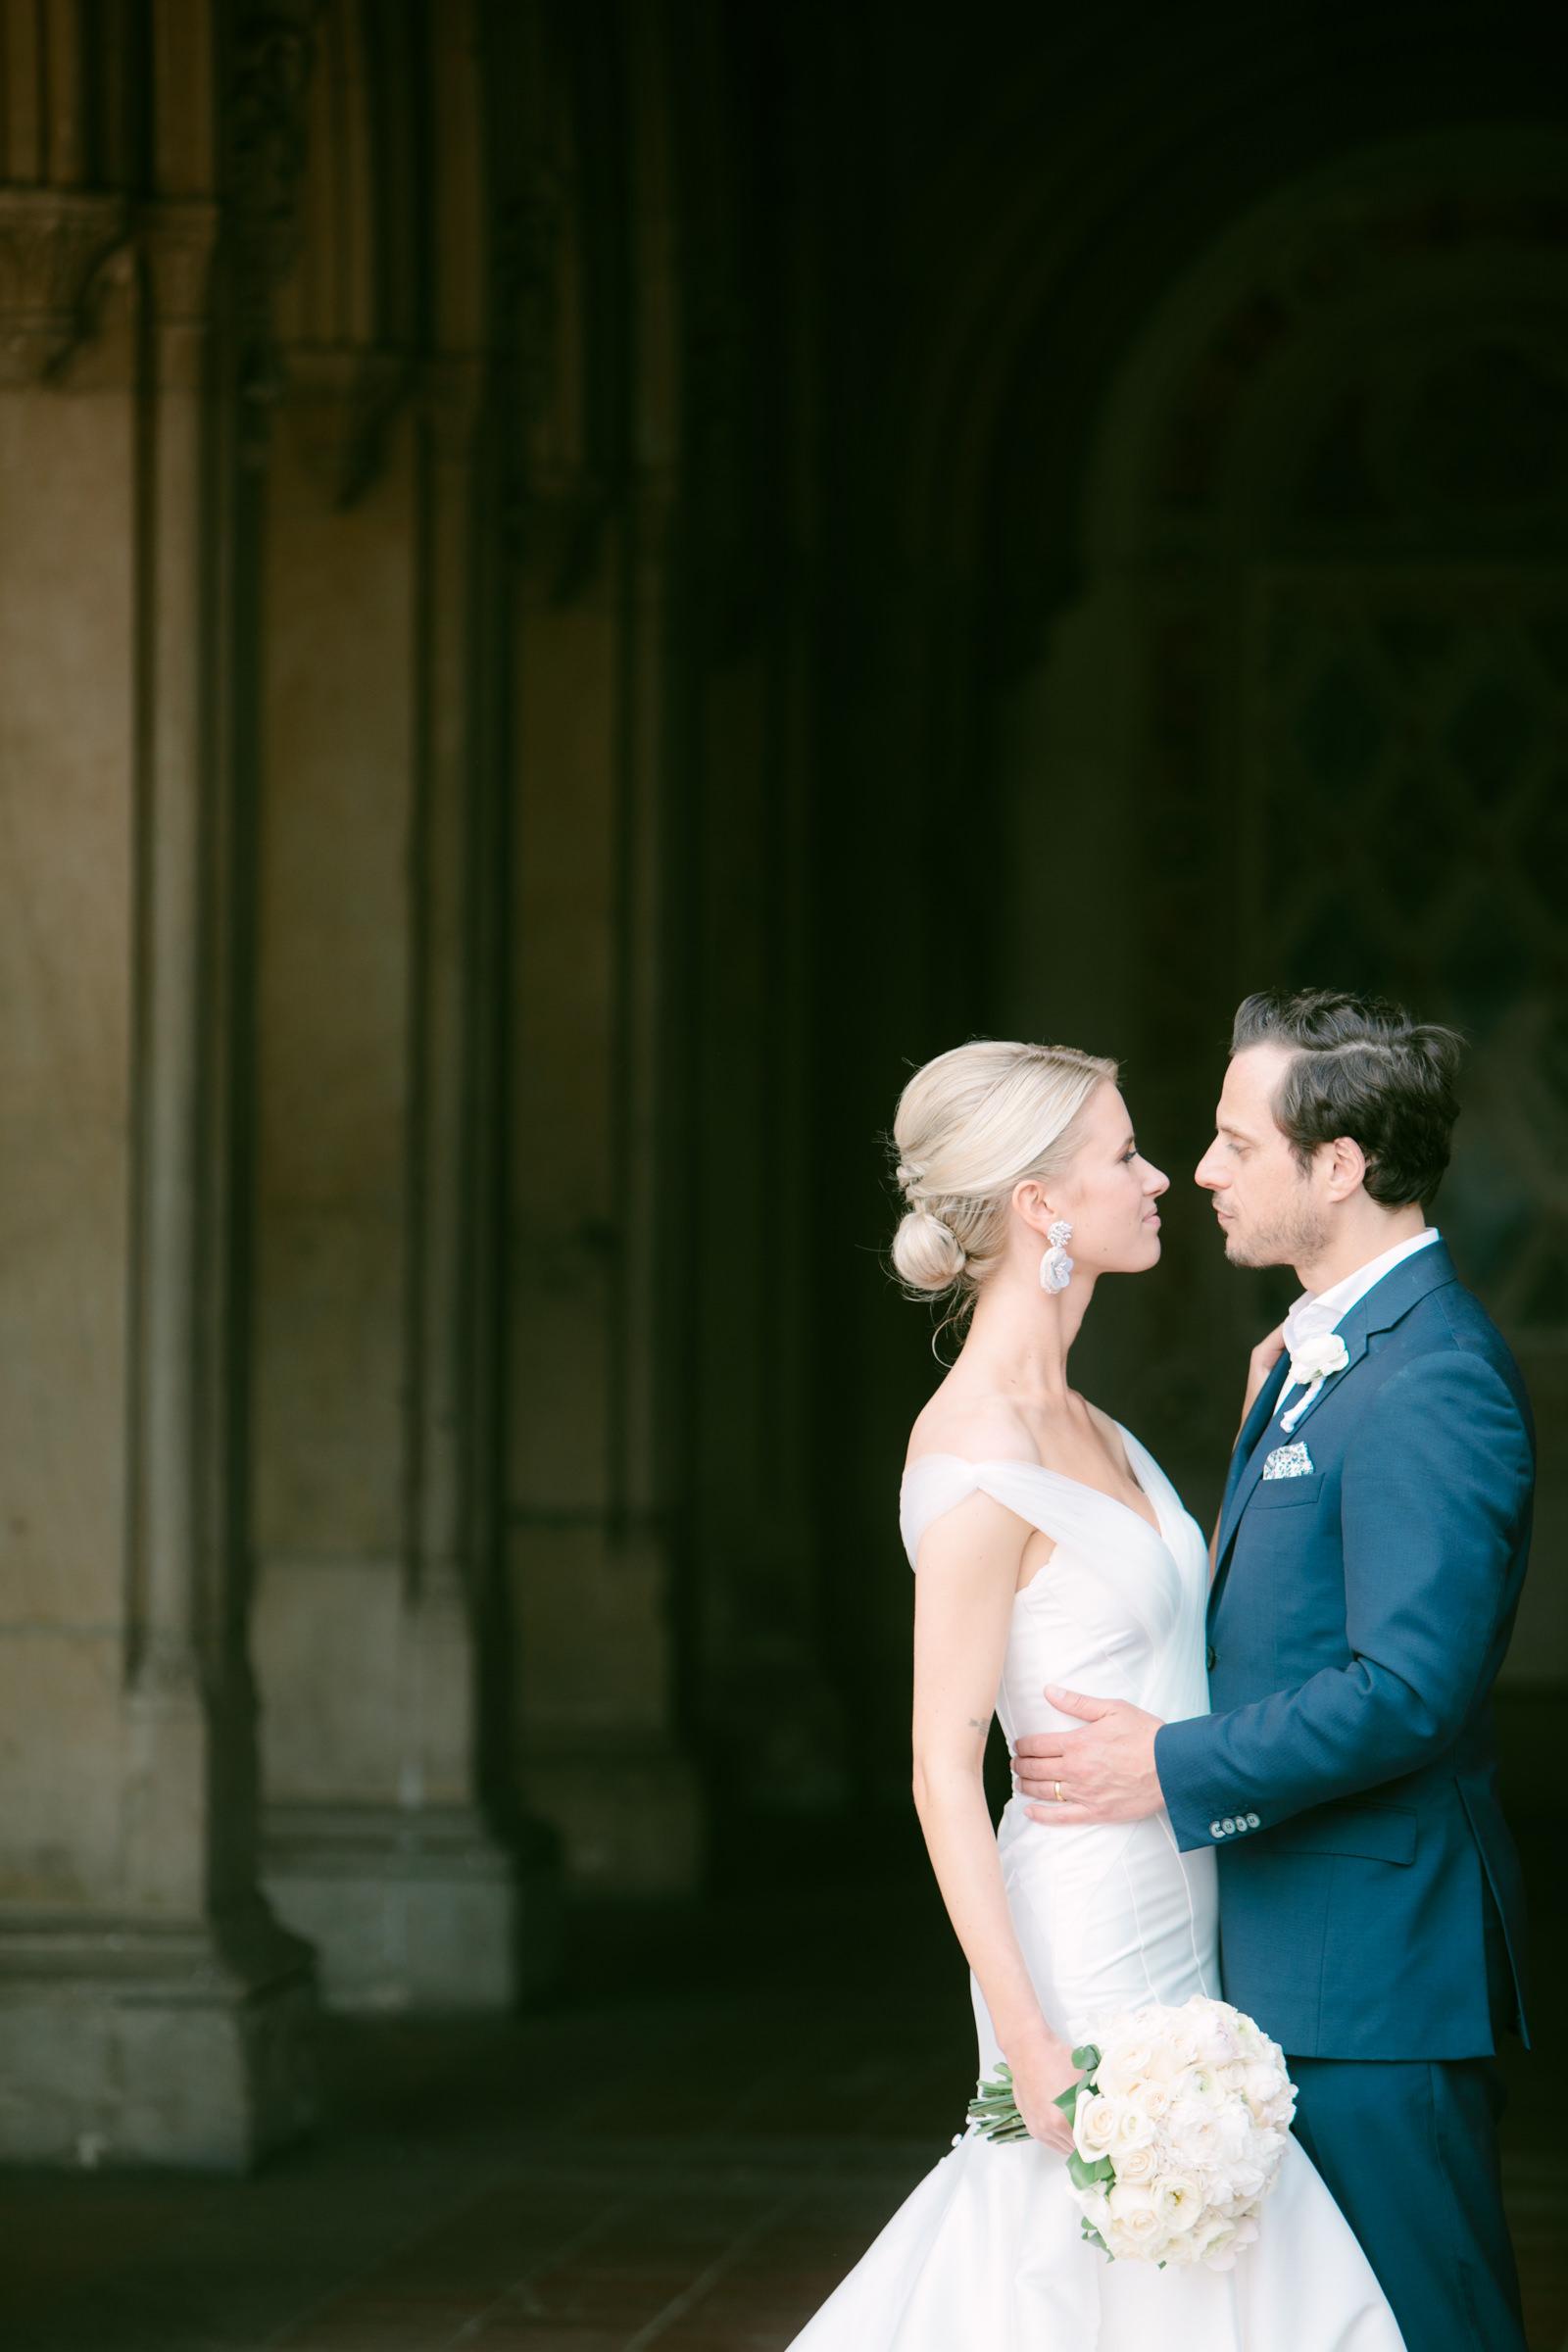 Intimate-NYC_wedding_ by Tanya Isaeva-116.jpg